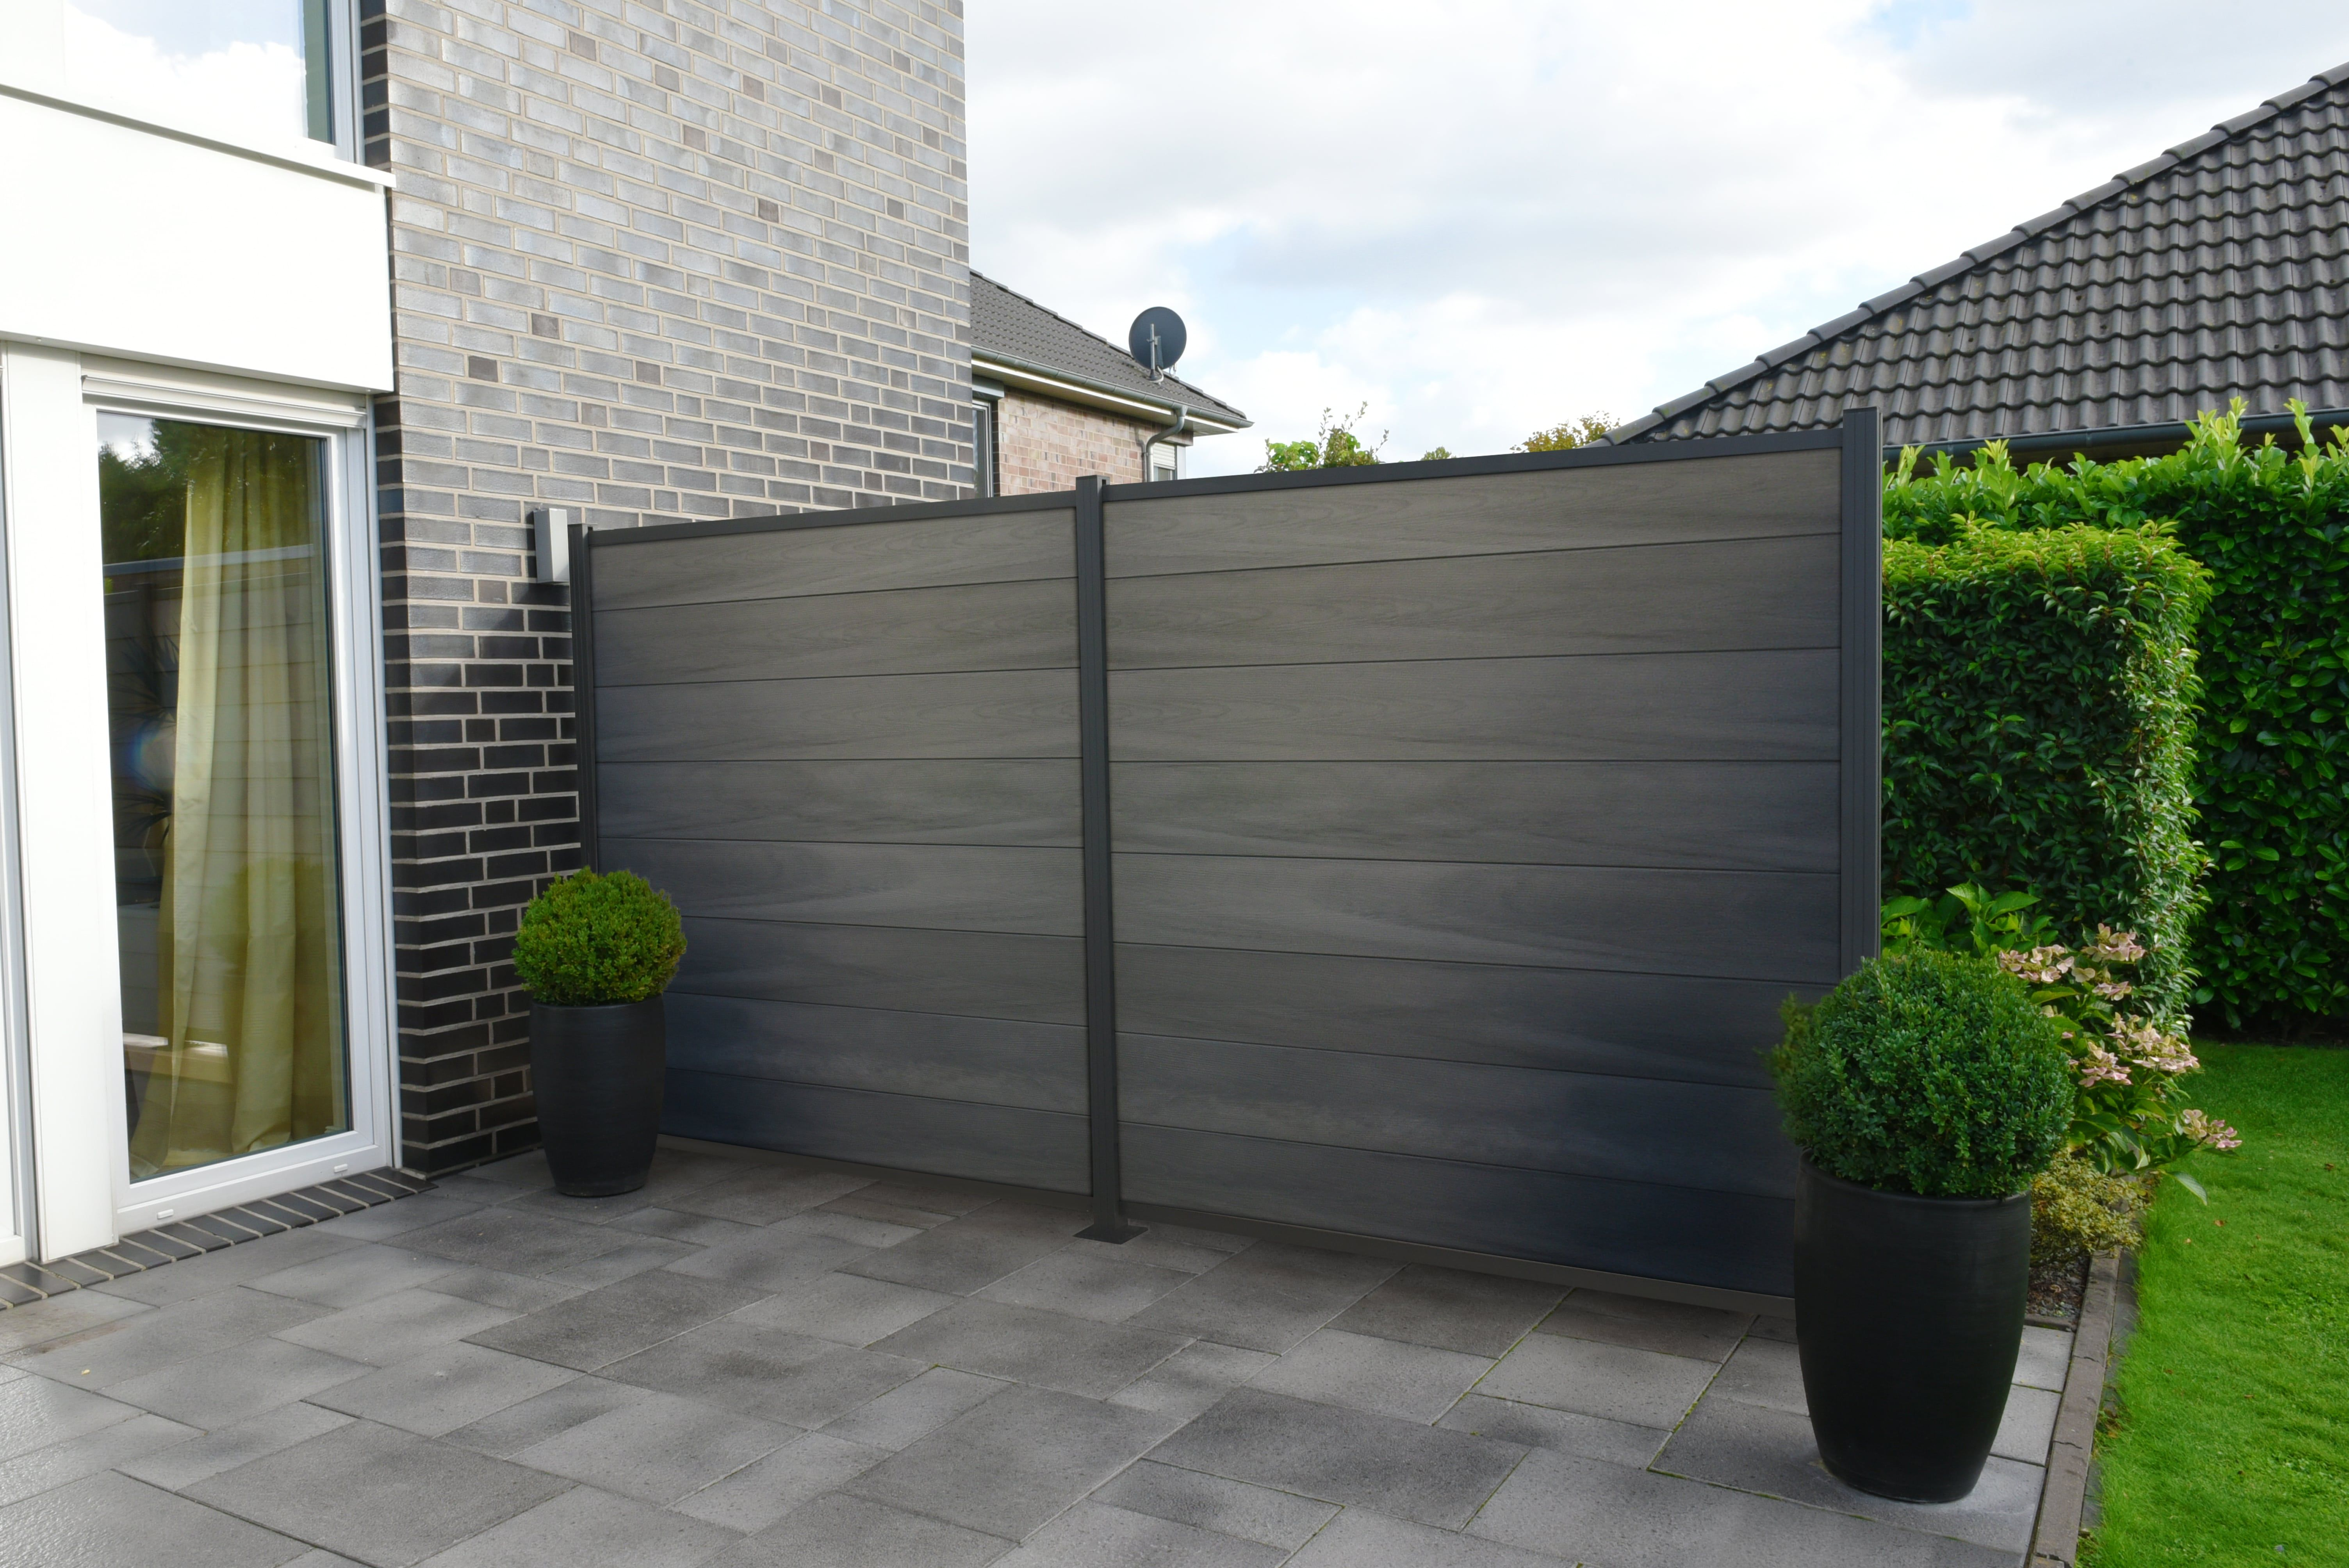 Bpc Steckzaun Sylt Co Extrudiert Greystone Anthrazit Ca 180x180 Cm Steckzaun Sichtschutzzaun Zaun